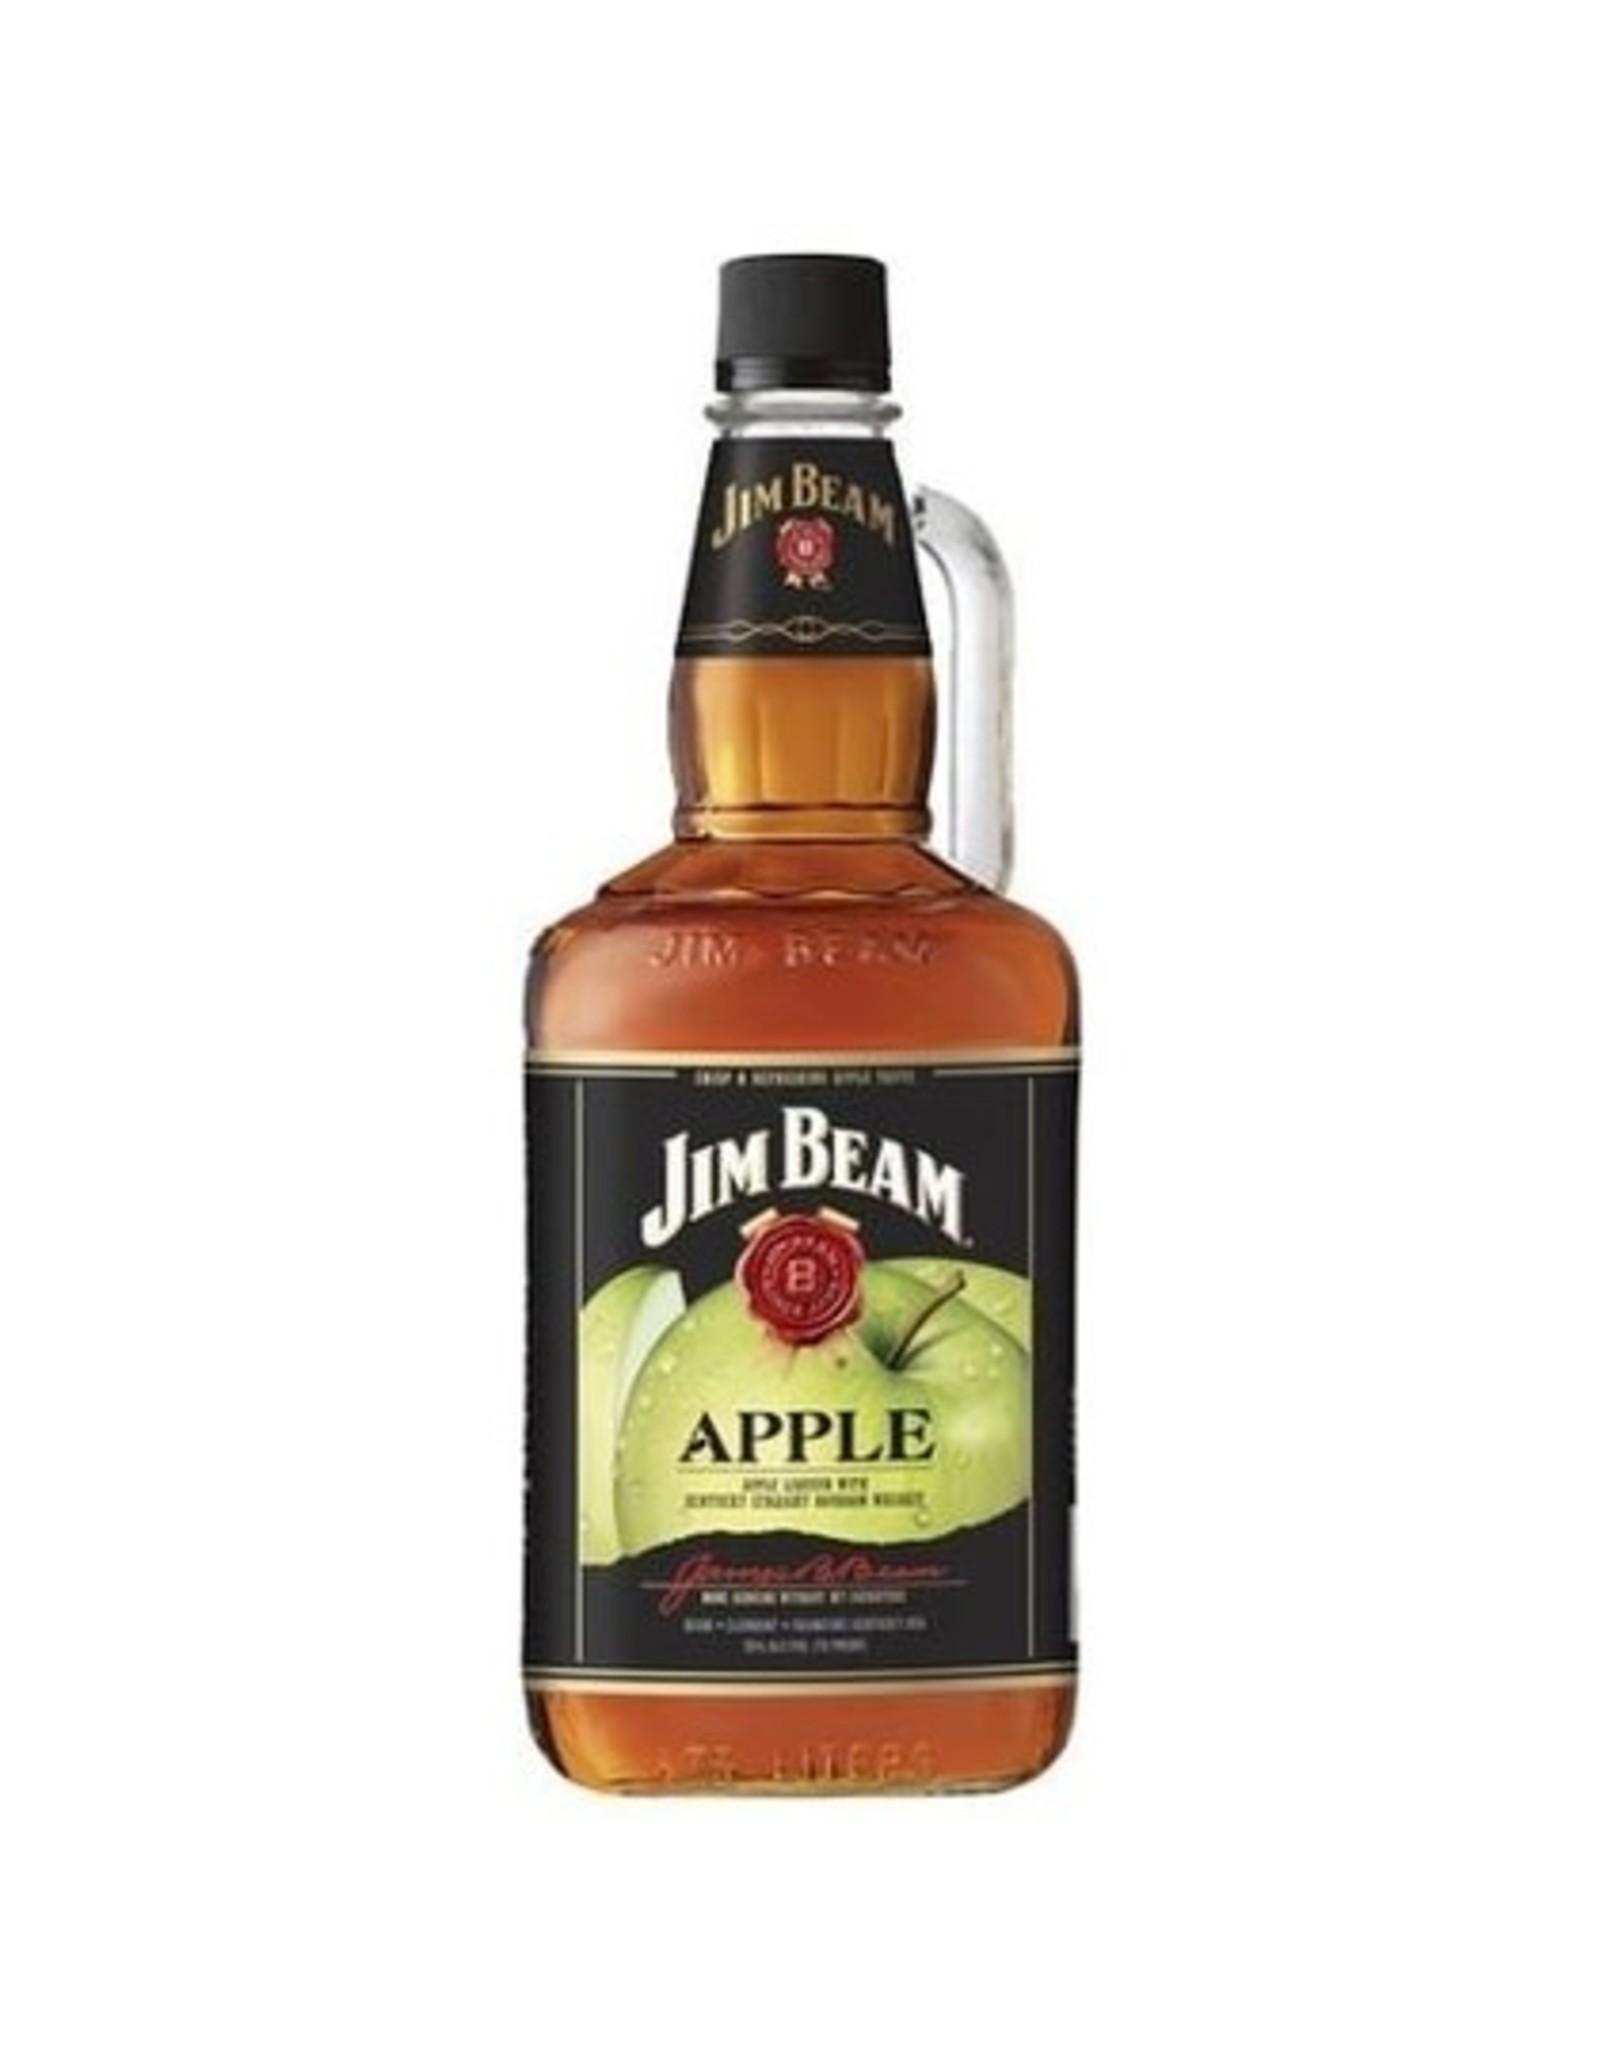 JIM BEAM APPLE 1.75L